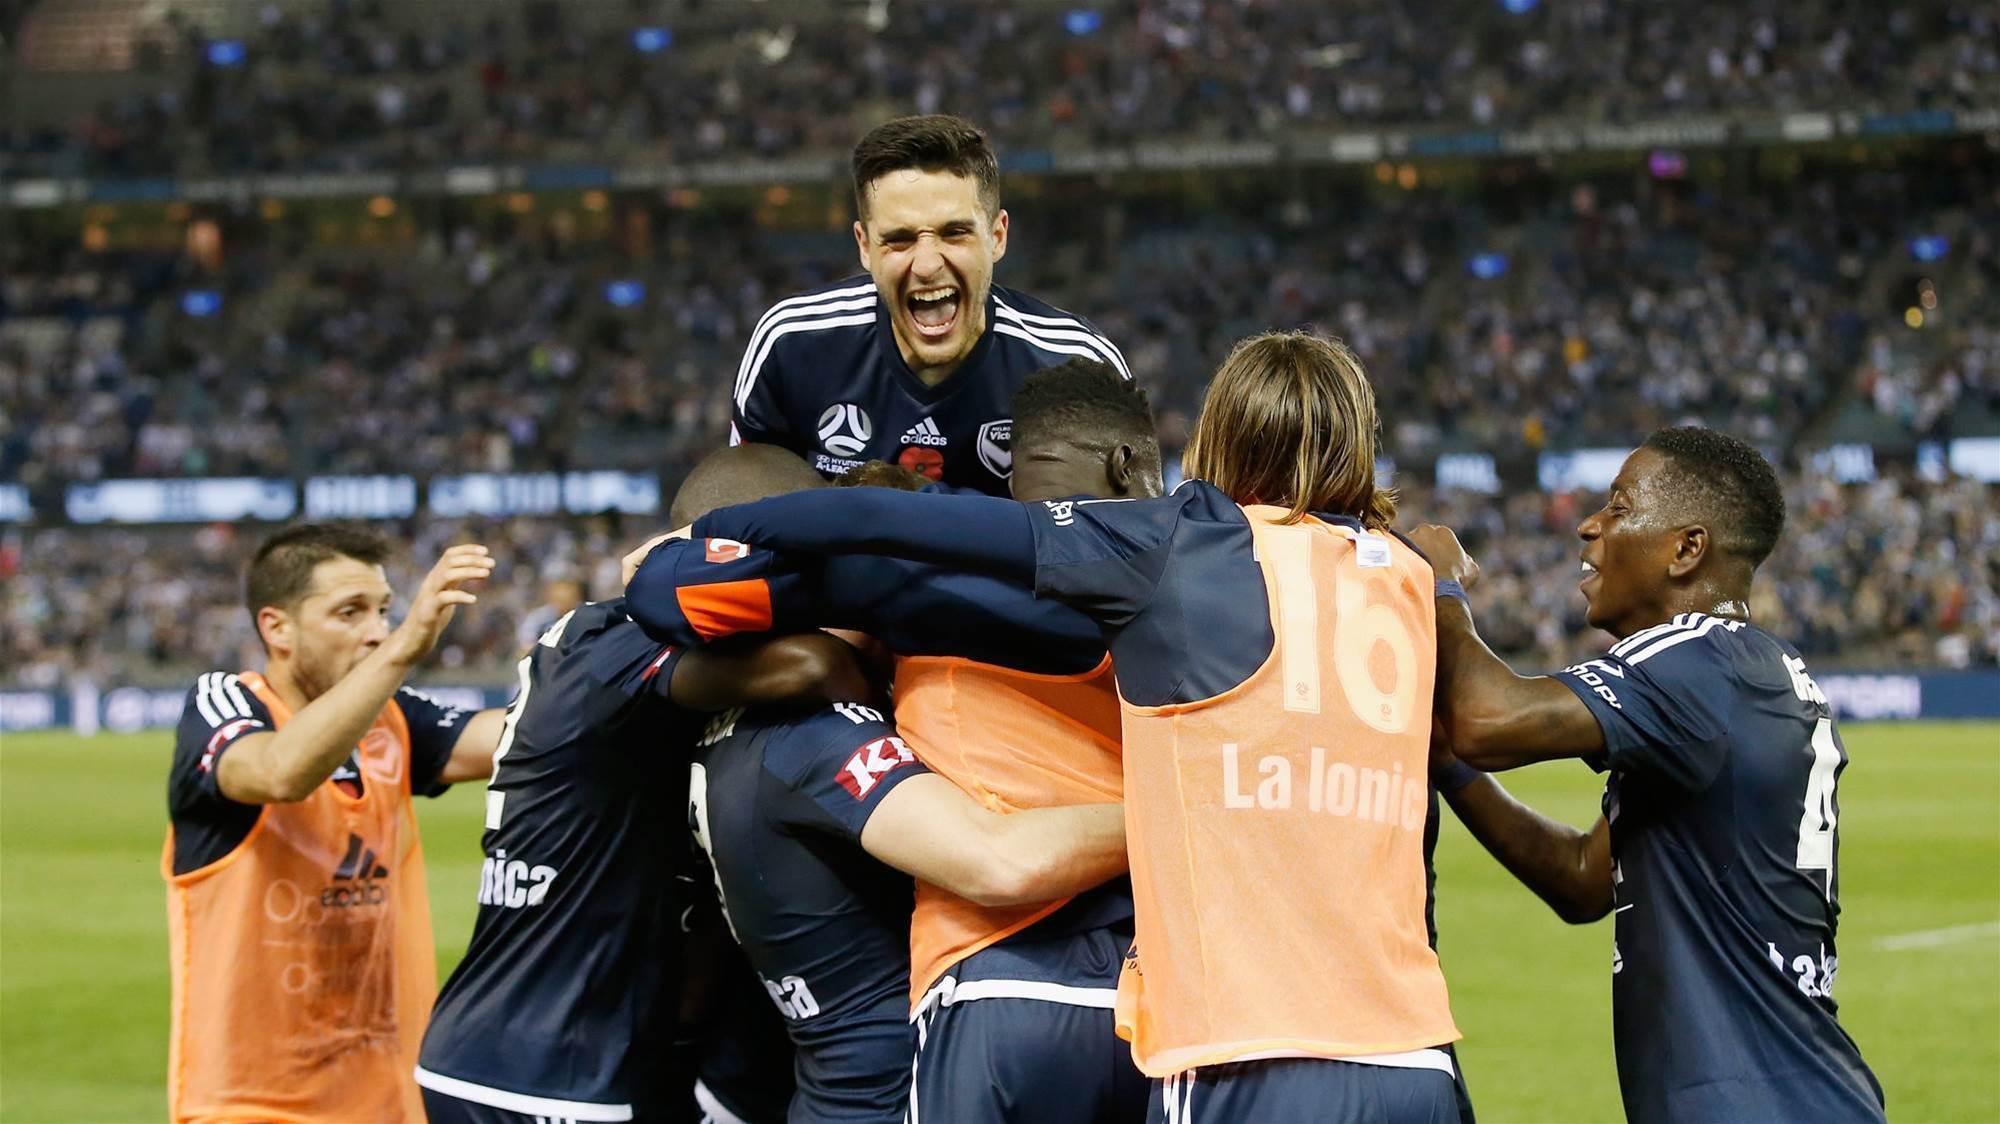 Melbourne Victory vs Brisbane Roar player ratings